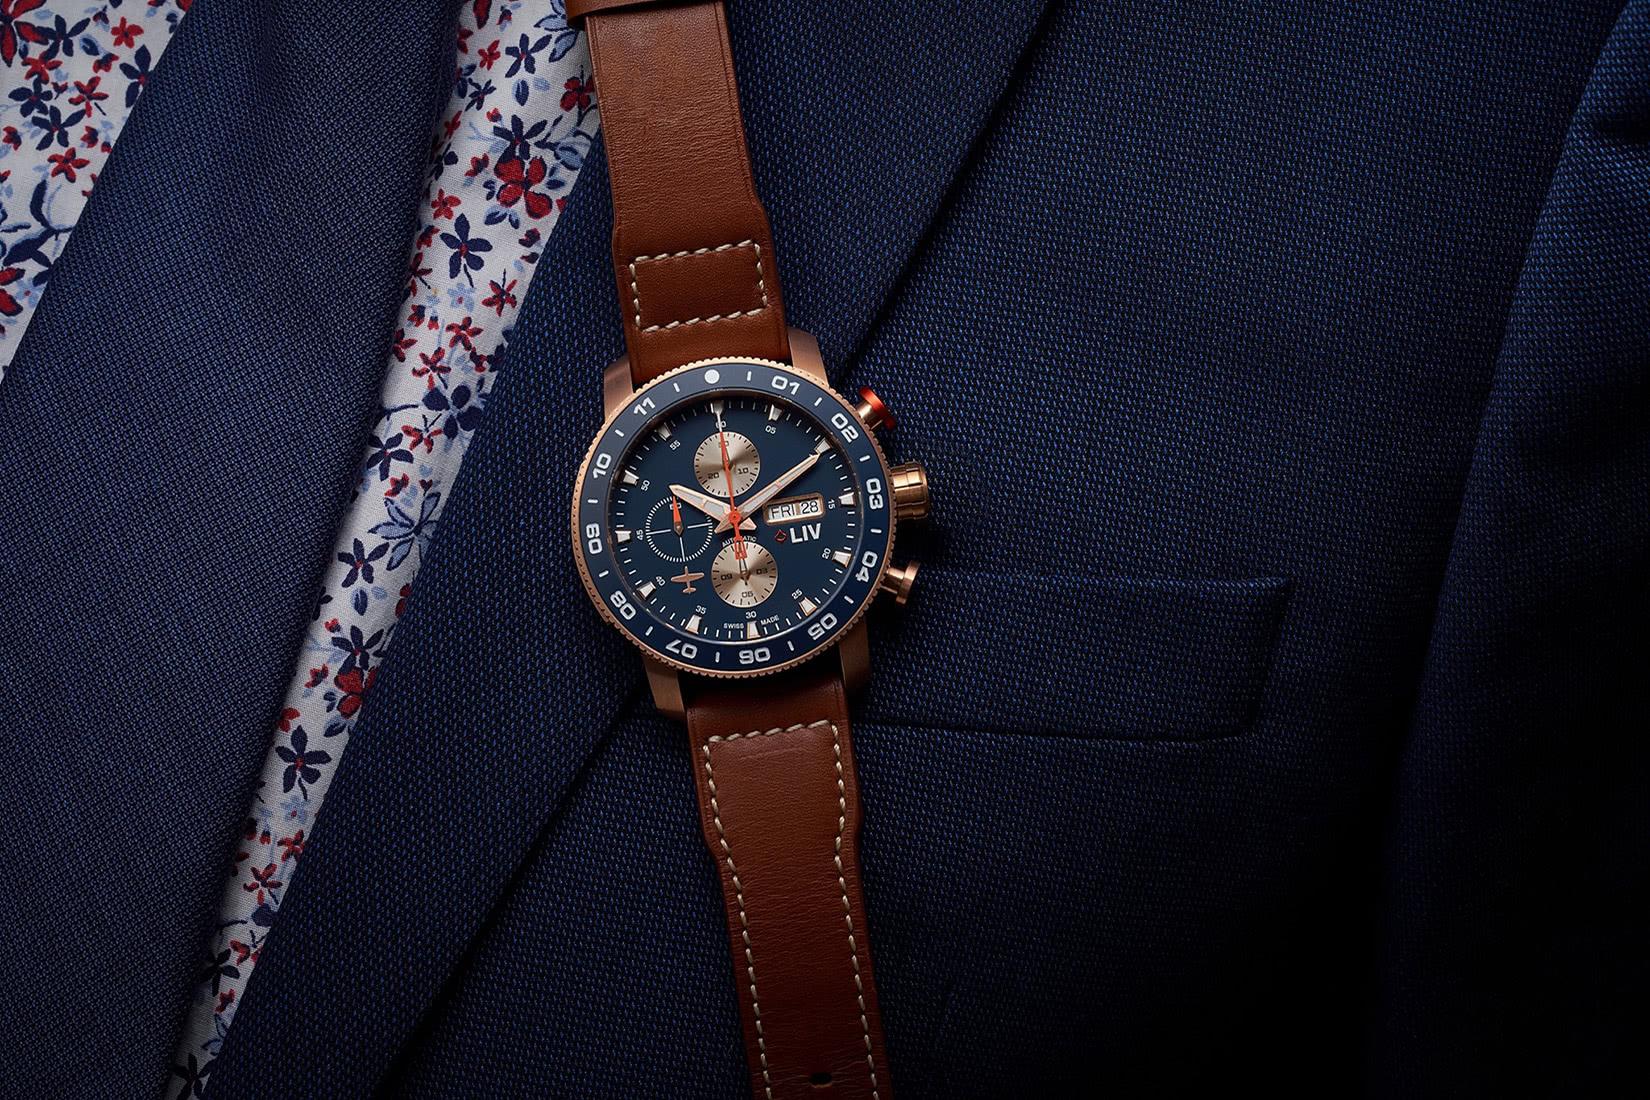 best luxury watch brands liv - Luxe Digital